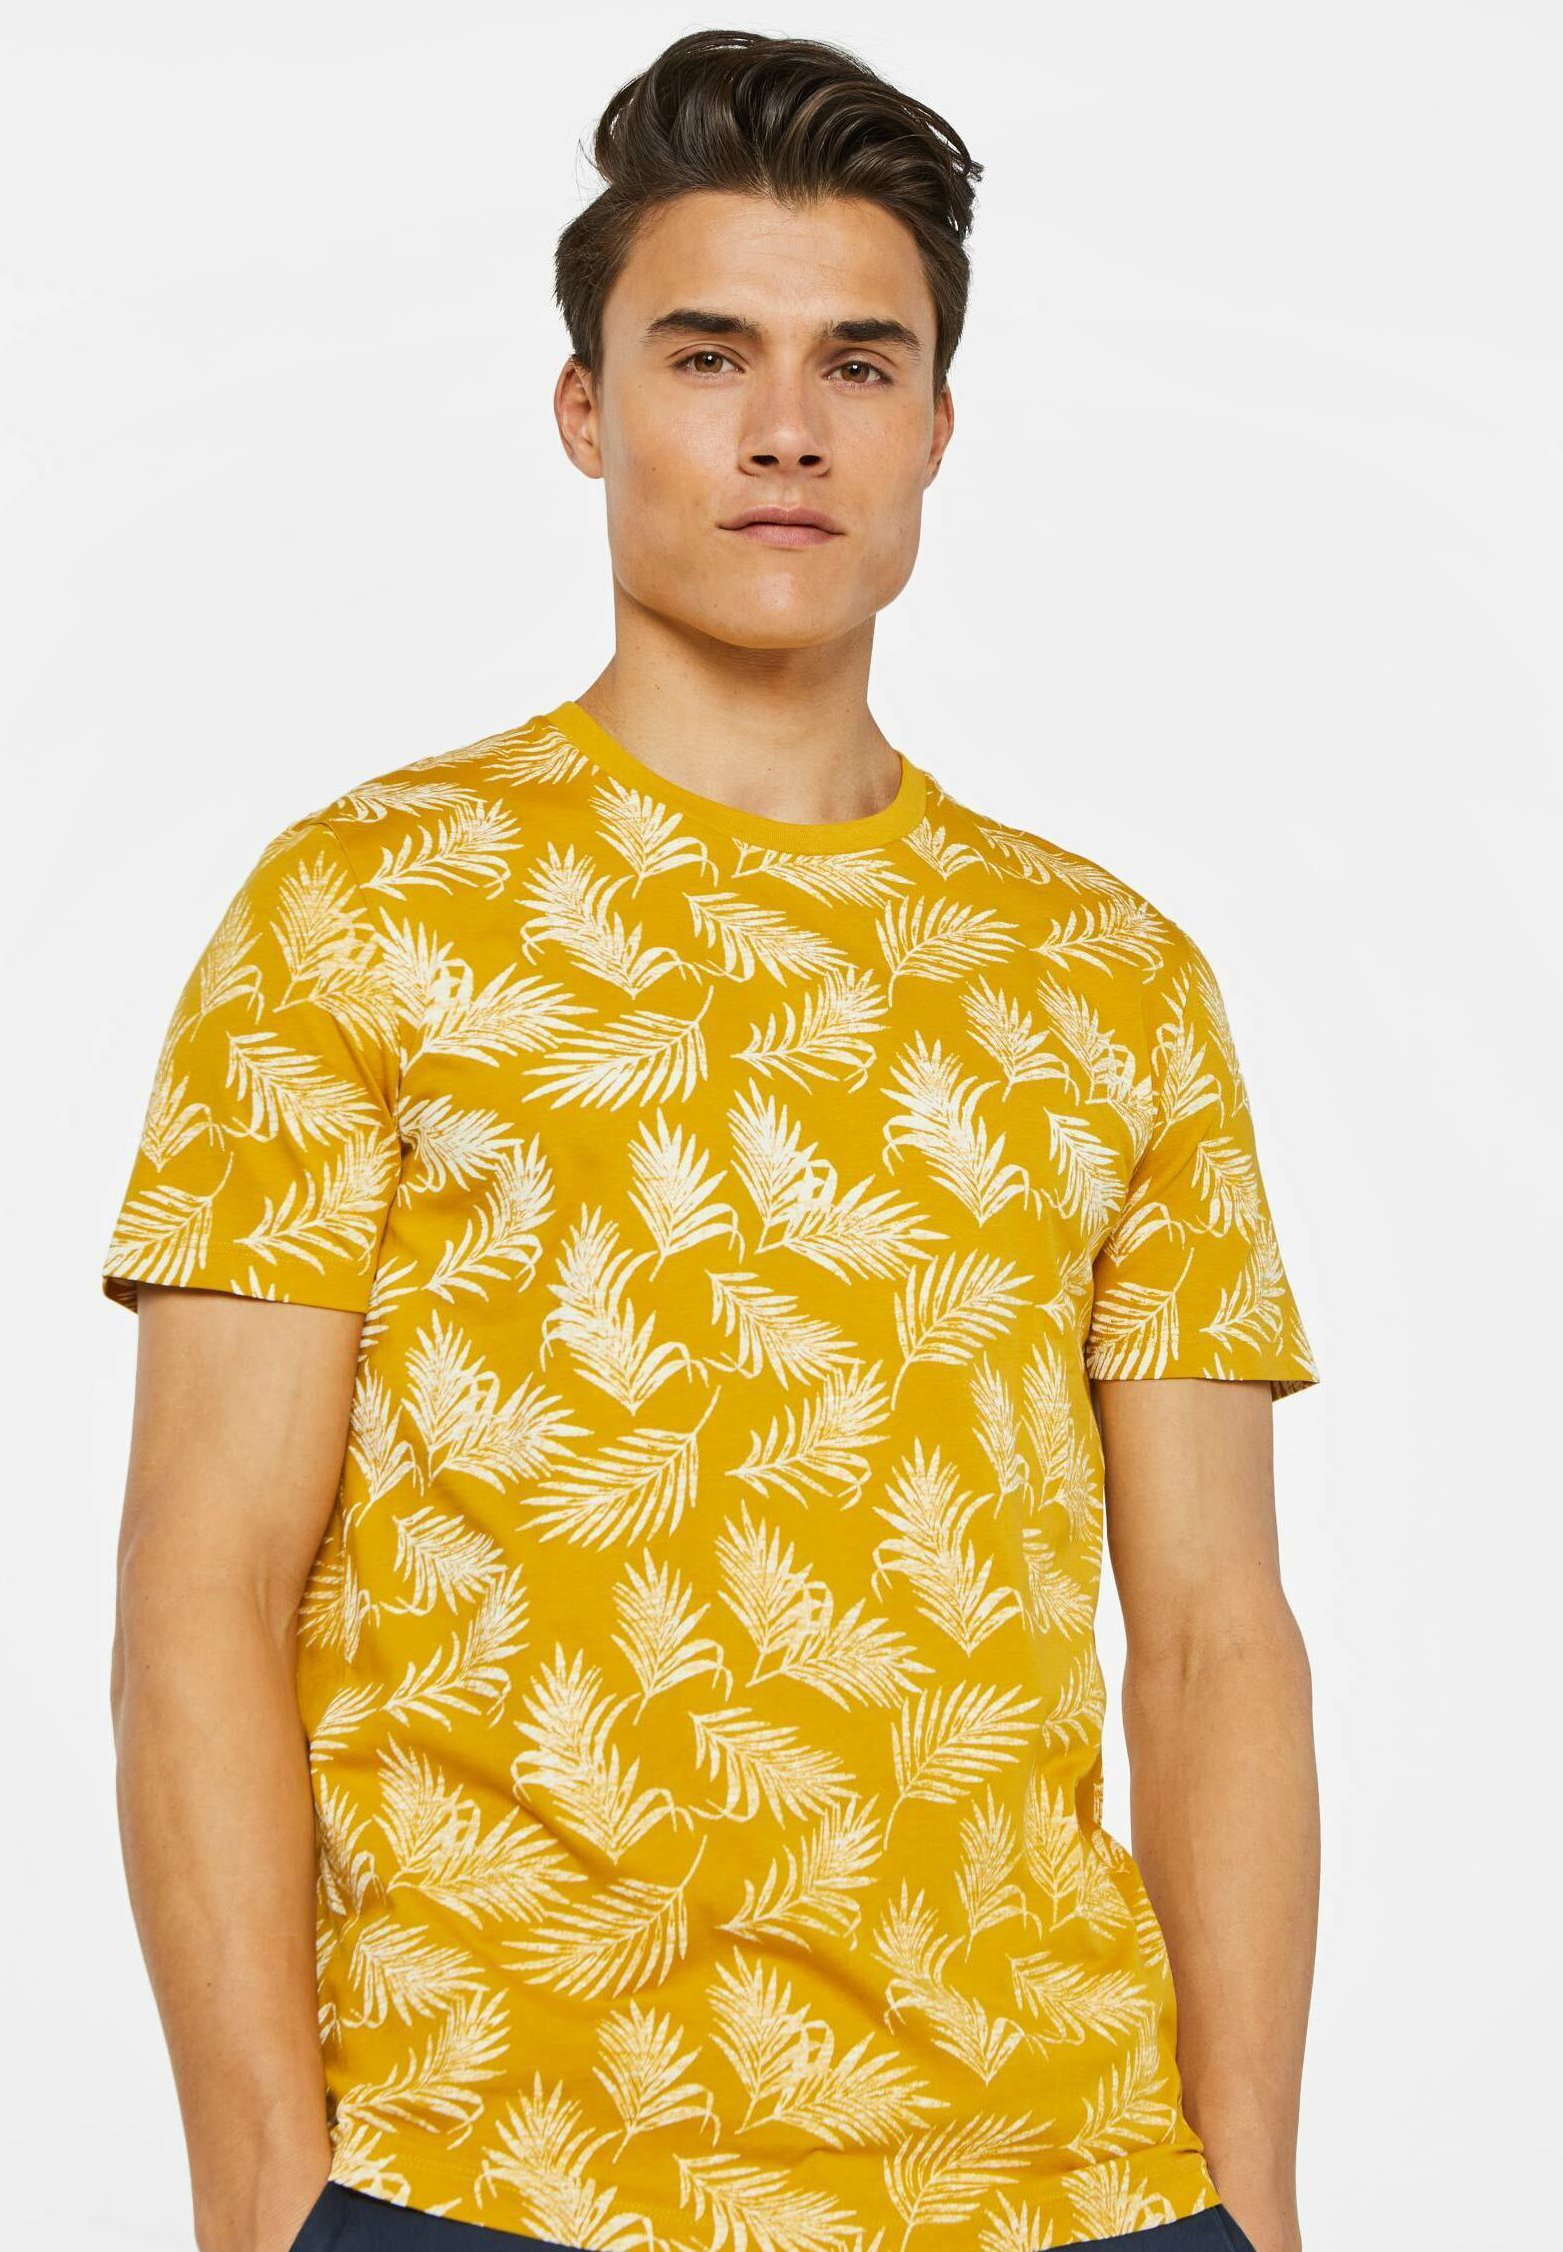 We Fashion Mit Blättermuster - T-shirt Print Mustard Yellow